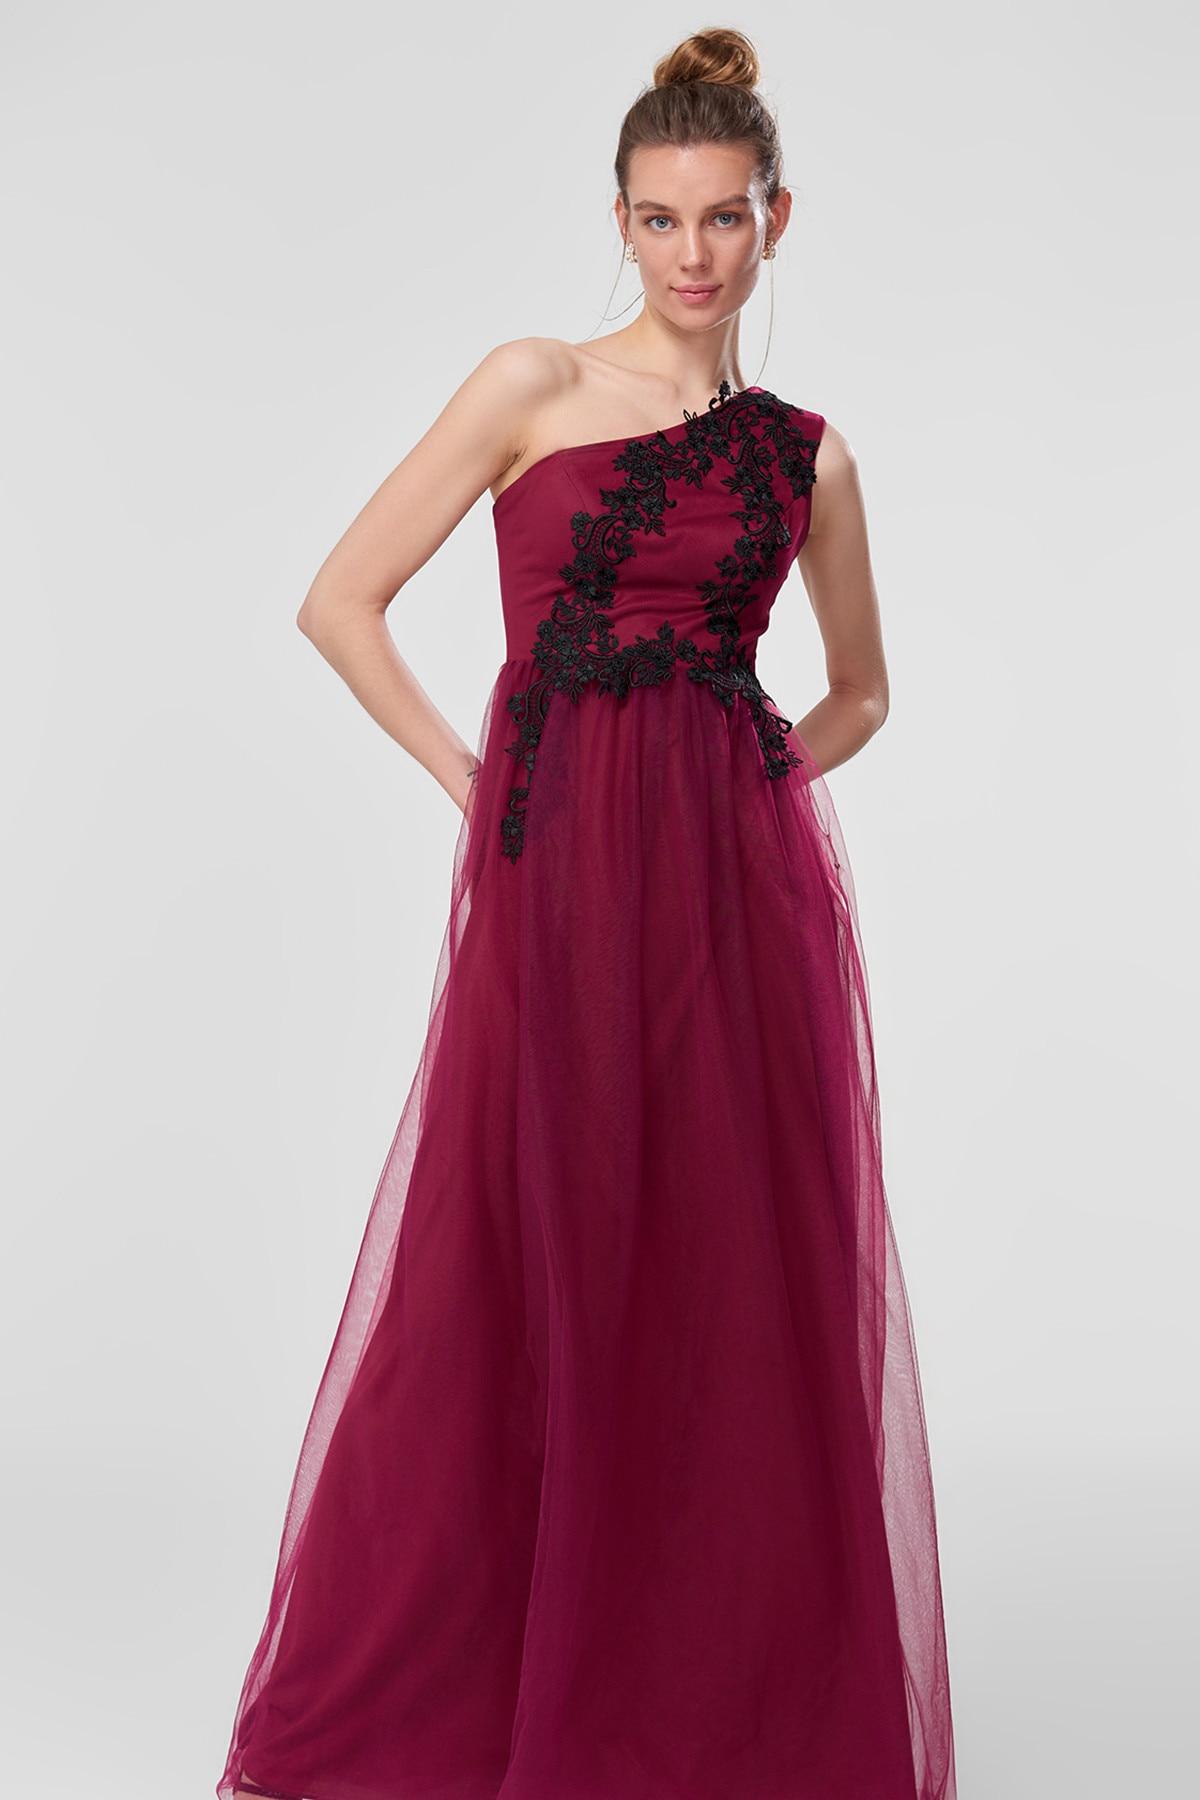 9cff74c3981d2 Trendyol Advanced Accessory TPRSS18VF0016 Plum Evening Dress